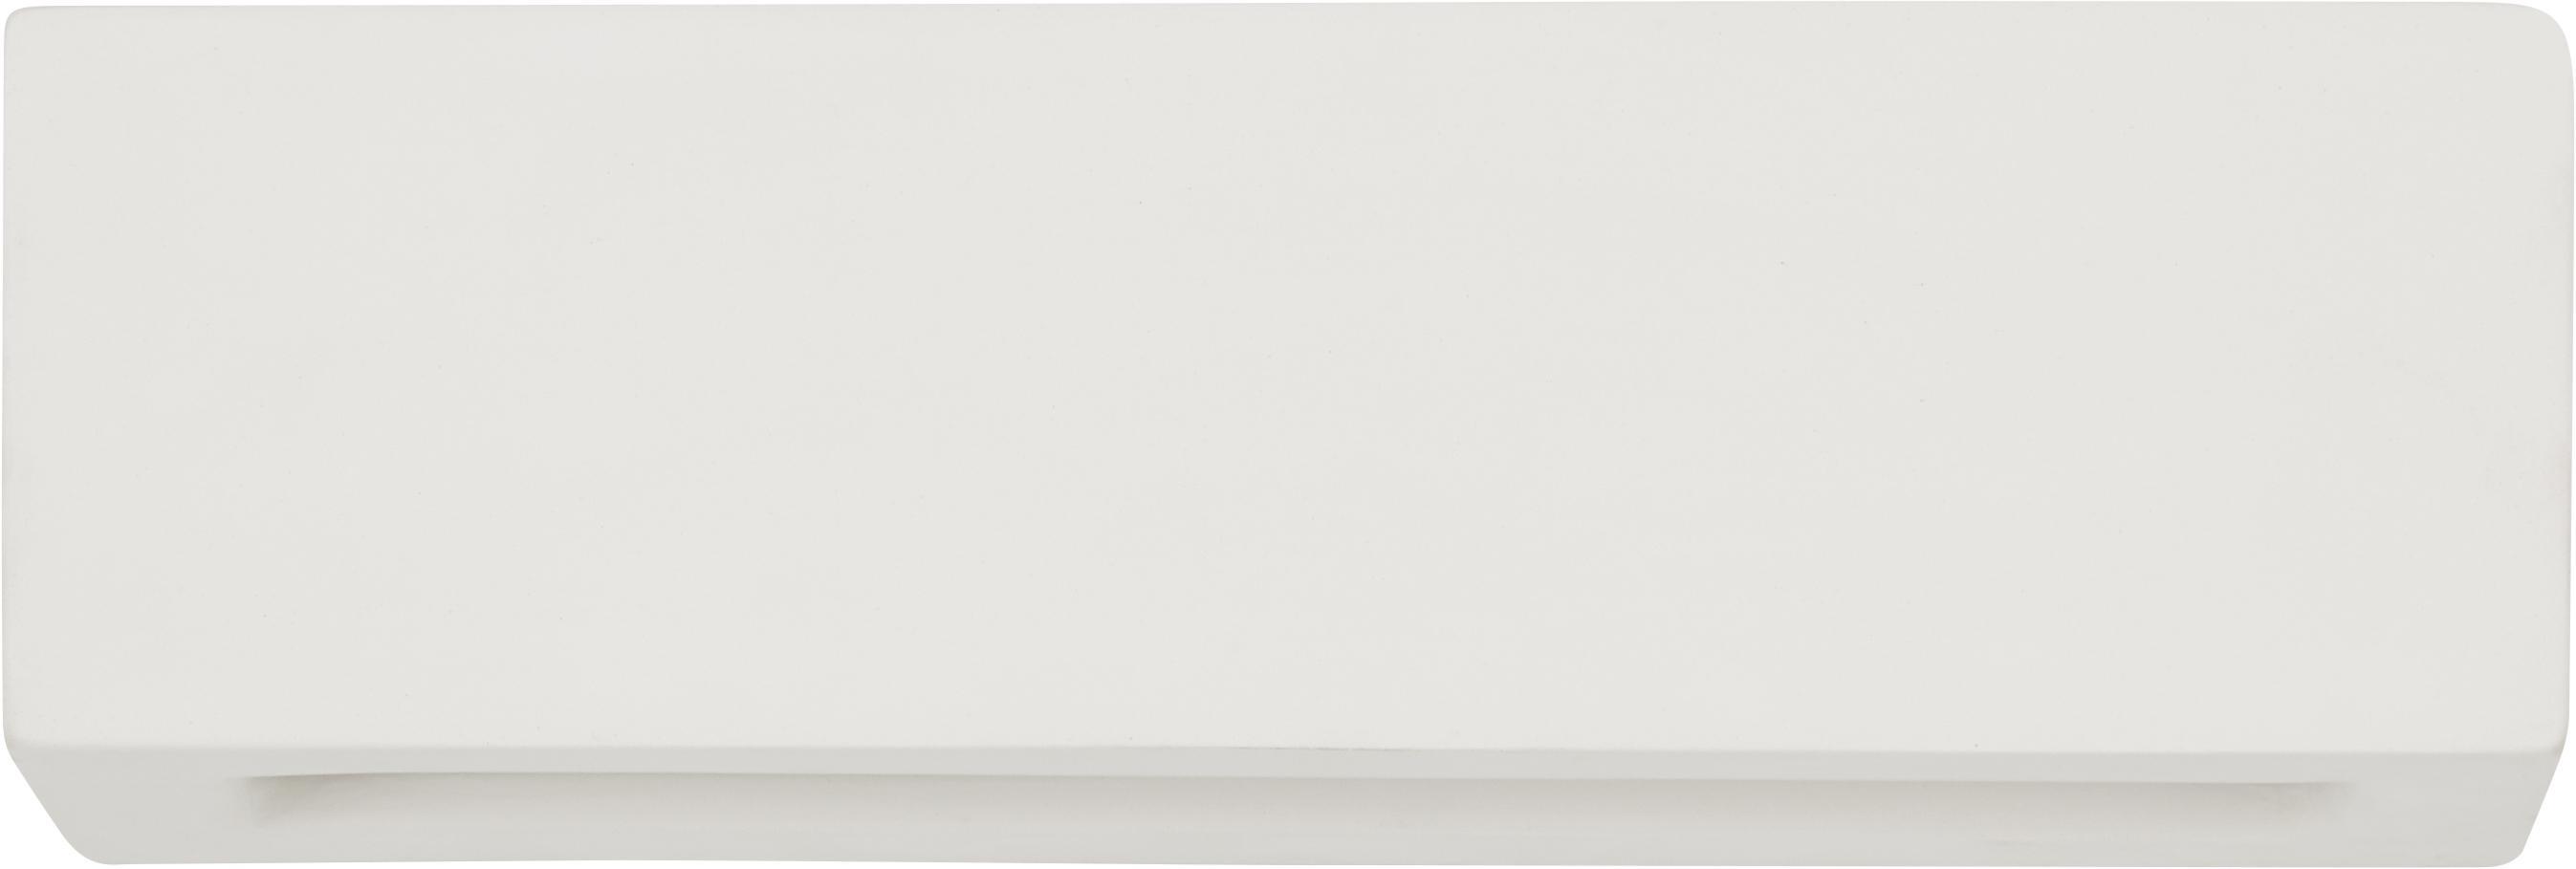 Keramik-Wandleuchte Madrid, Cremeweiß, 32 x 9 cm